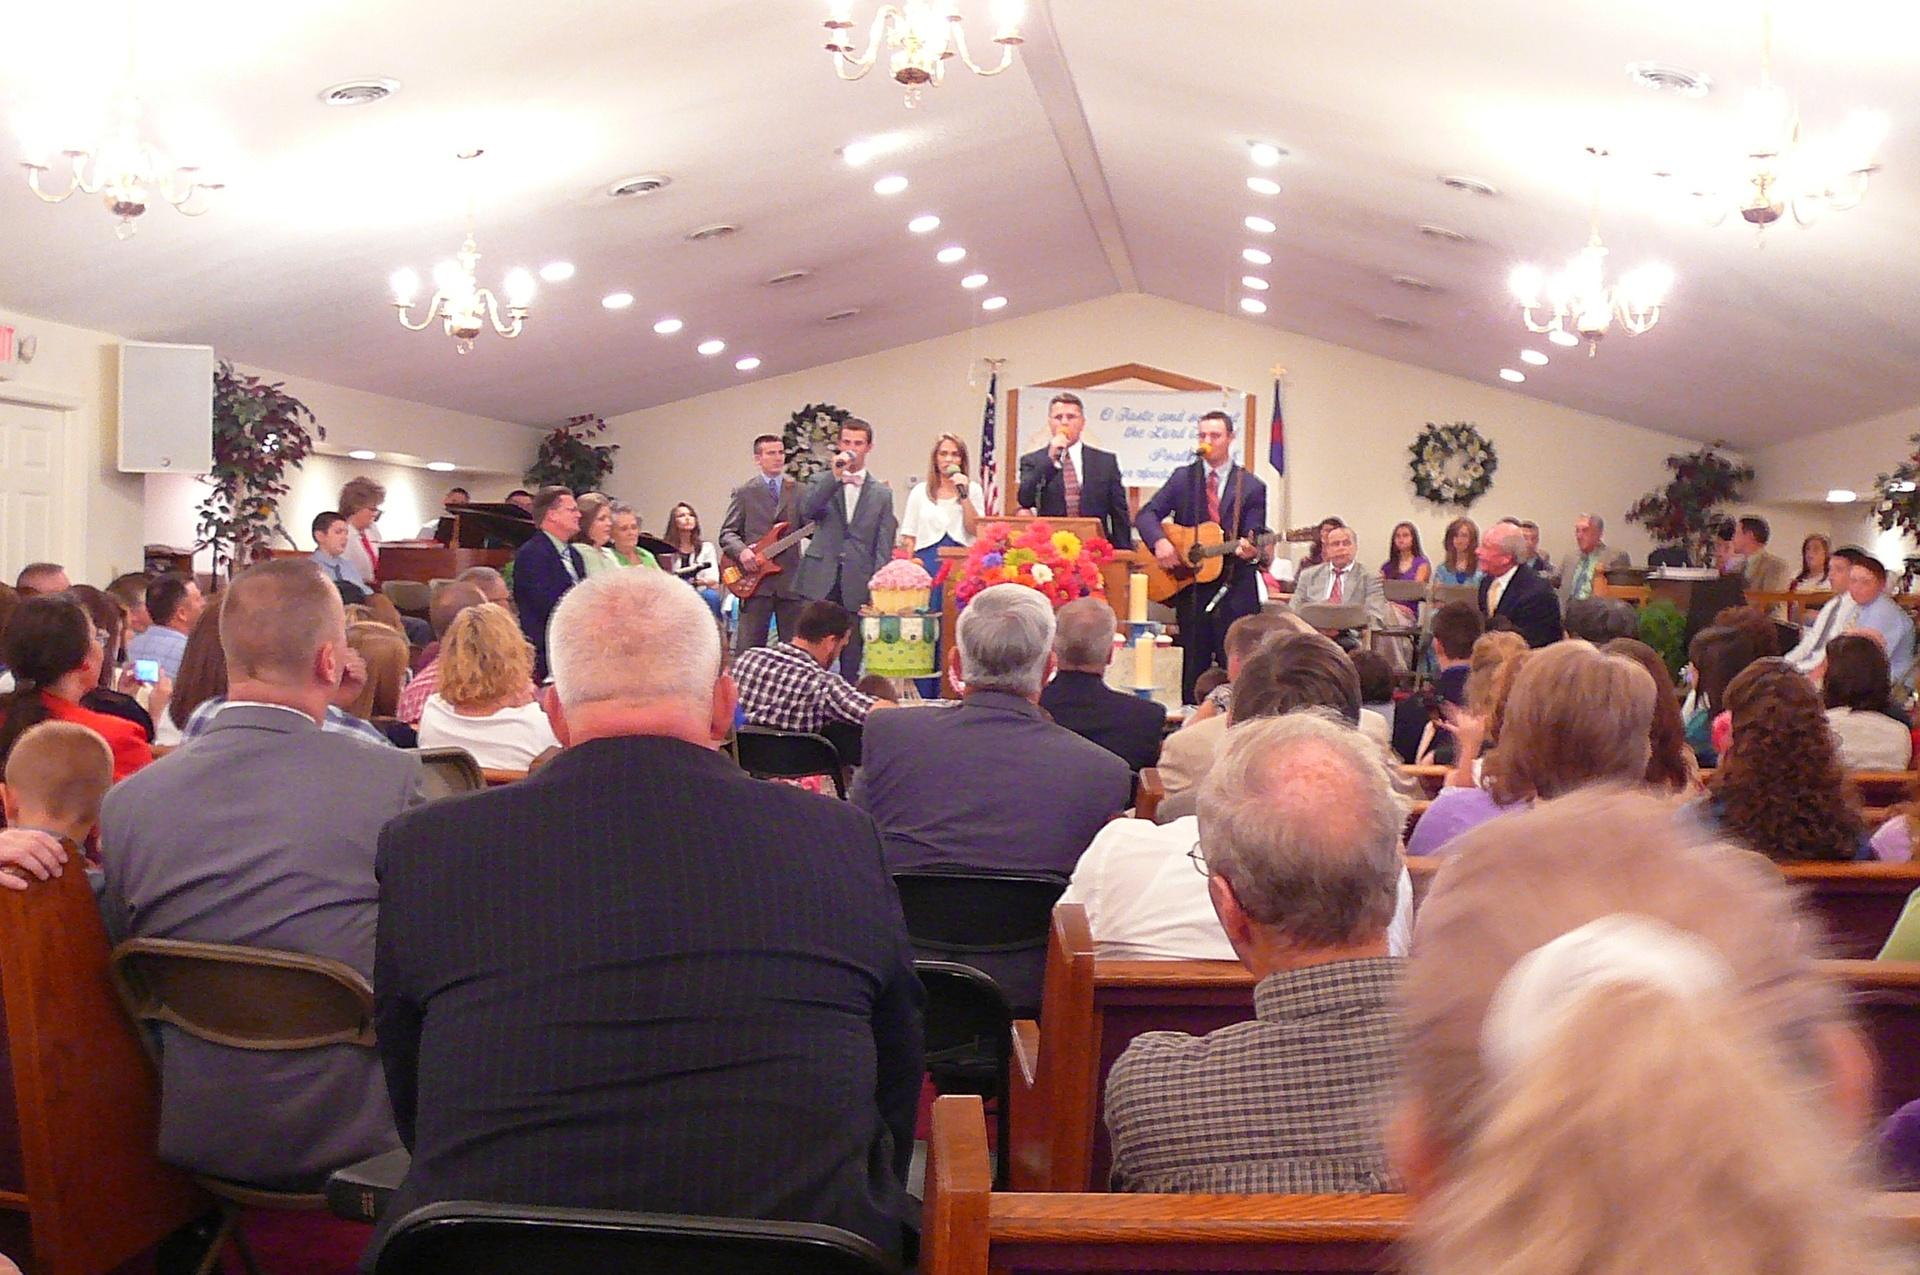 Life Baptist Church - St. Stephen, SC